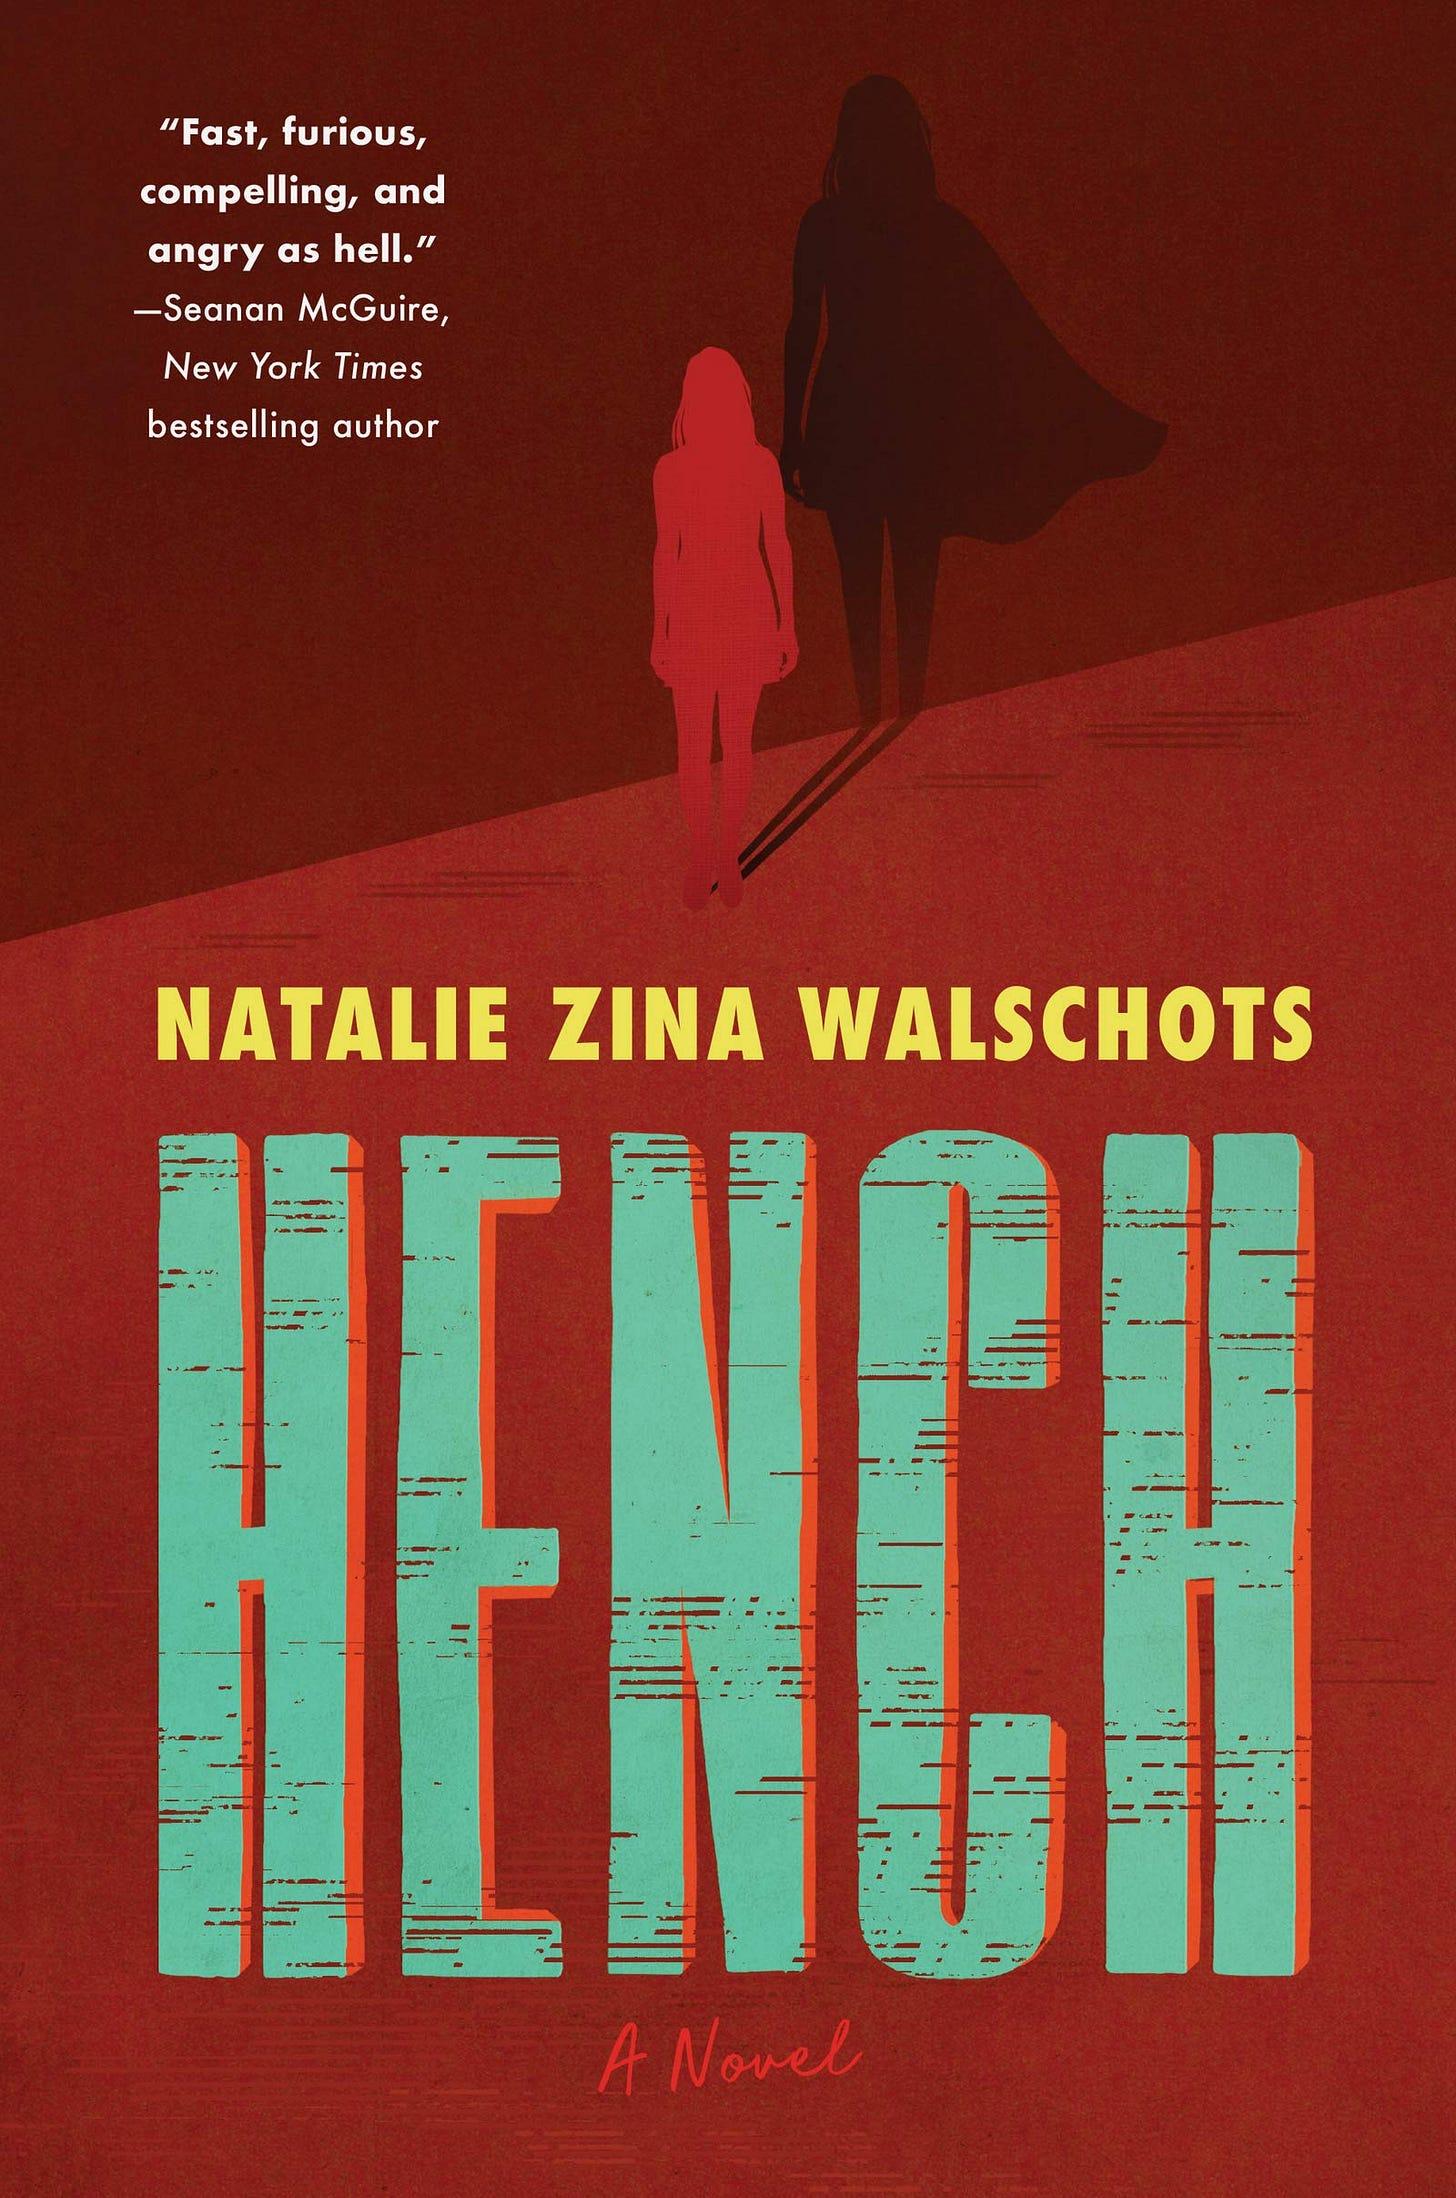 Amazon.com: Hench: A Novel (9780062978578): Walschots, Natalie Zina: Books